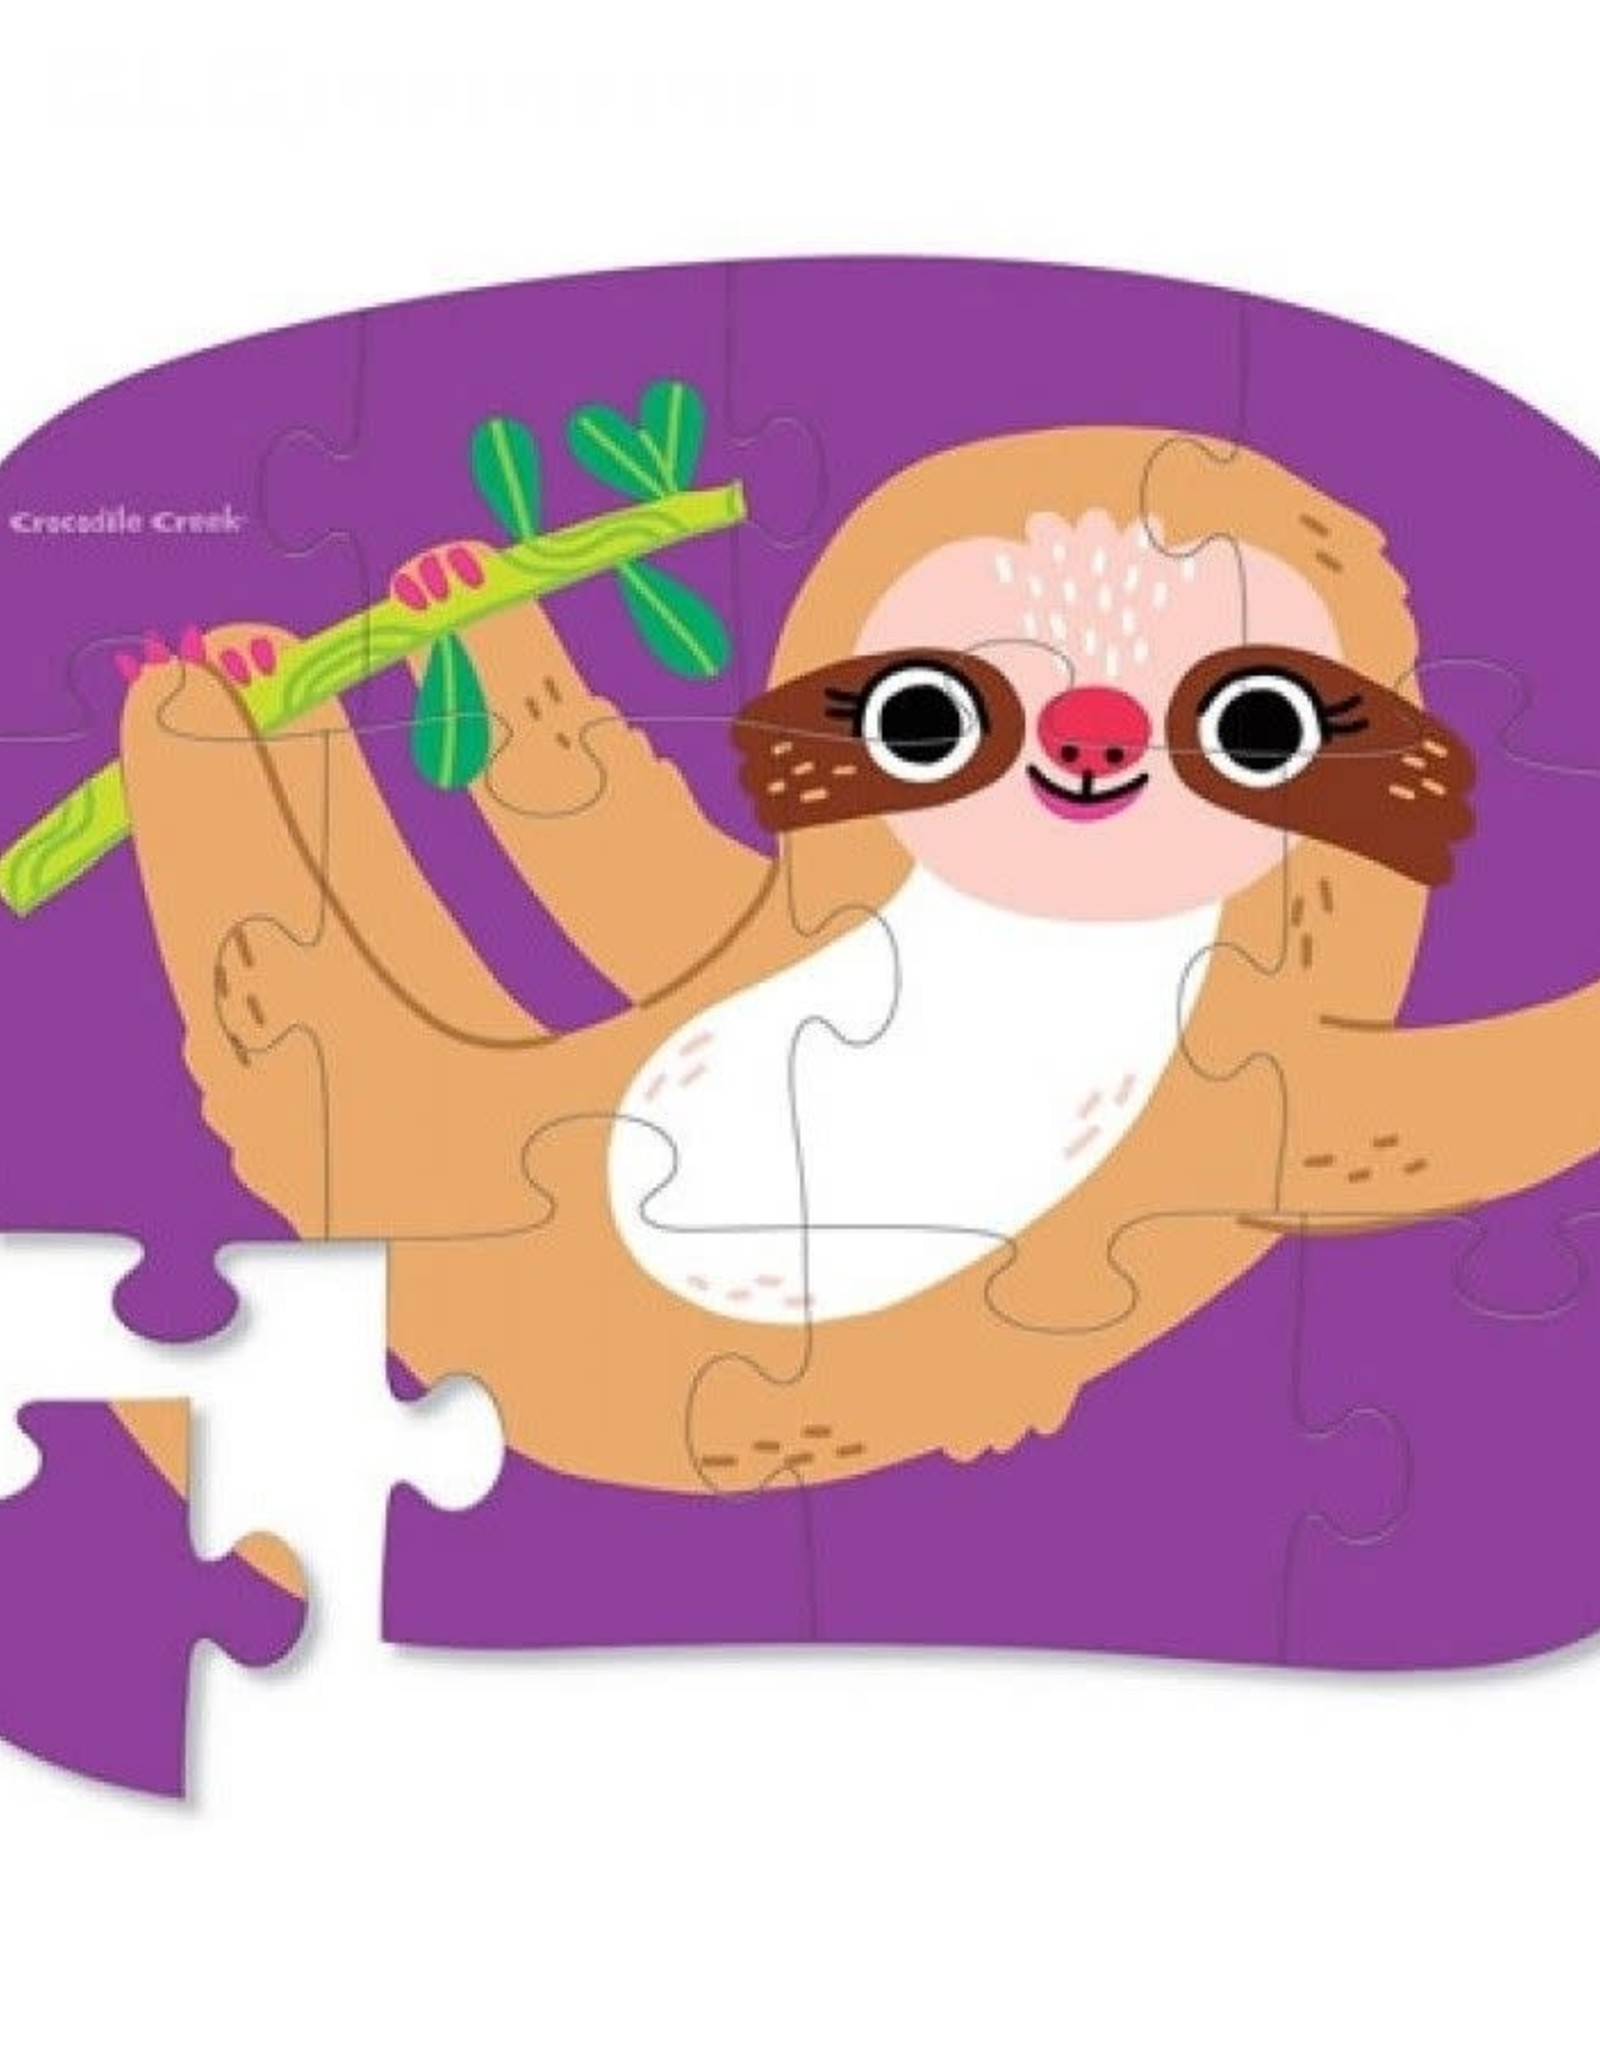 Crocodile Creek Minipuzzel Sweet Sloth 12st.